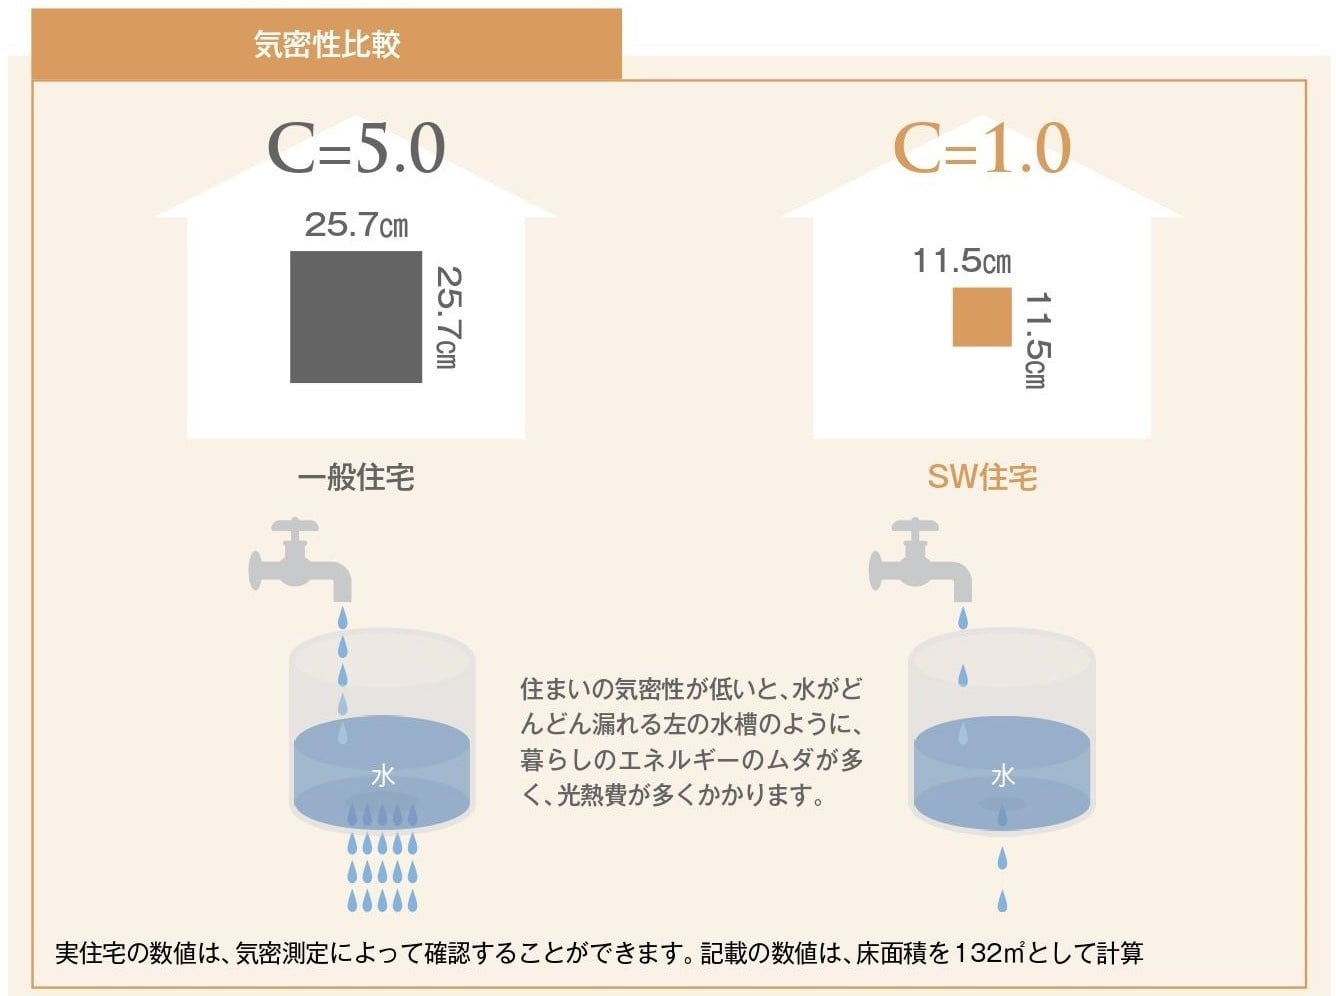 C値1.0を基準とした気密性の高い家